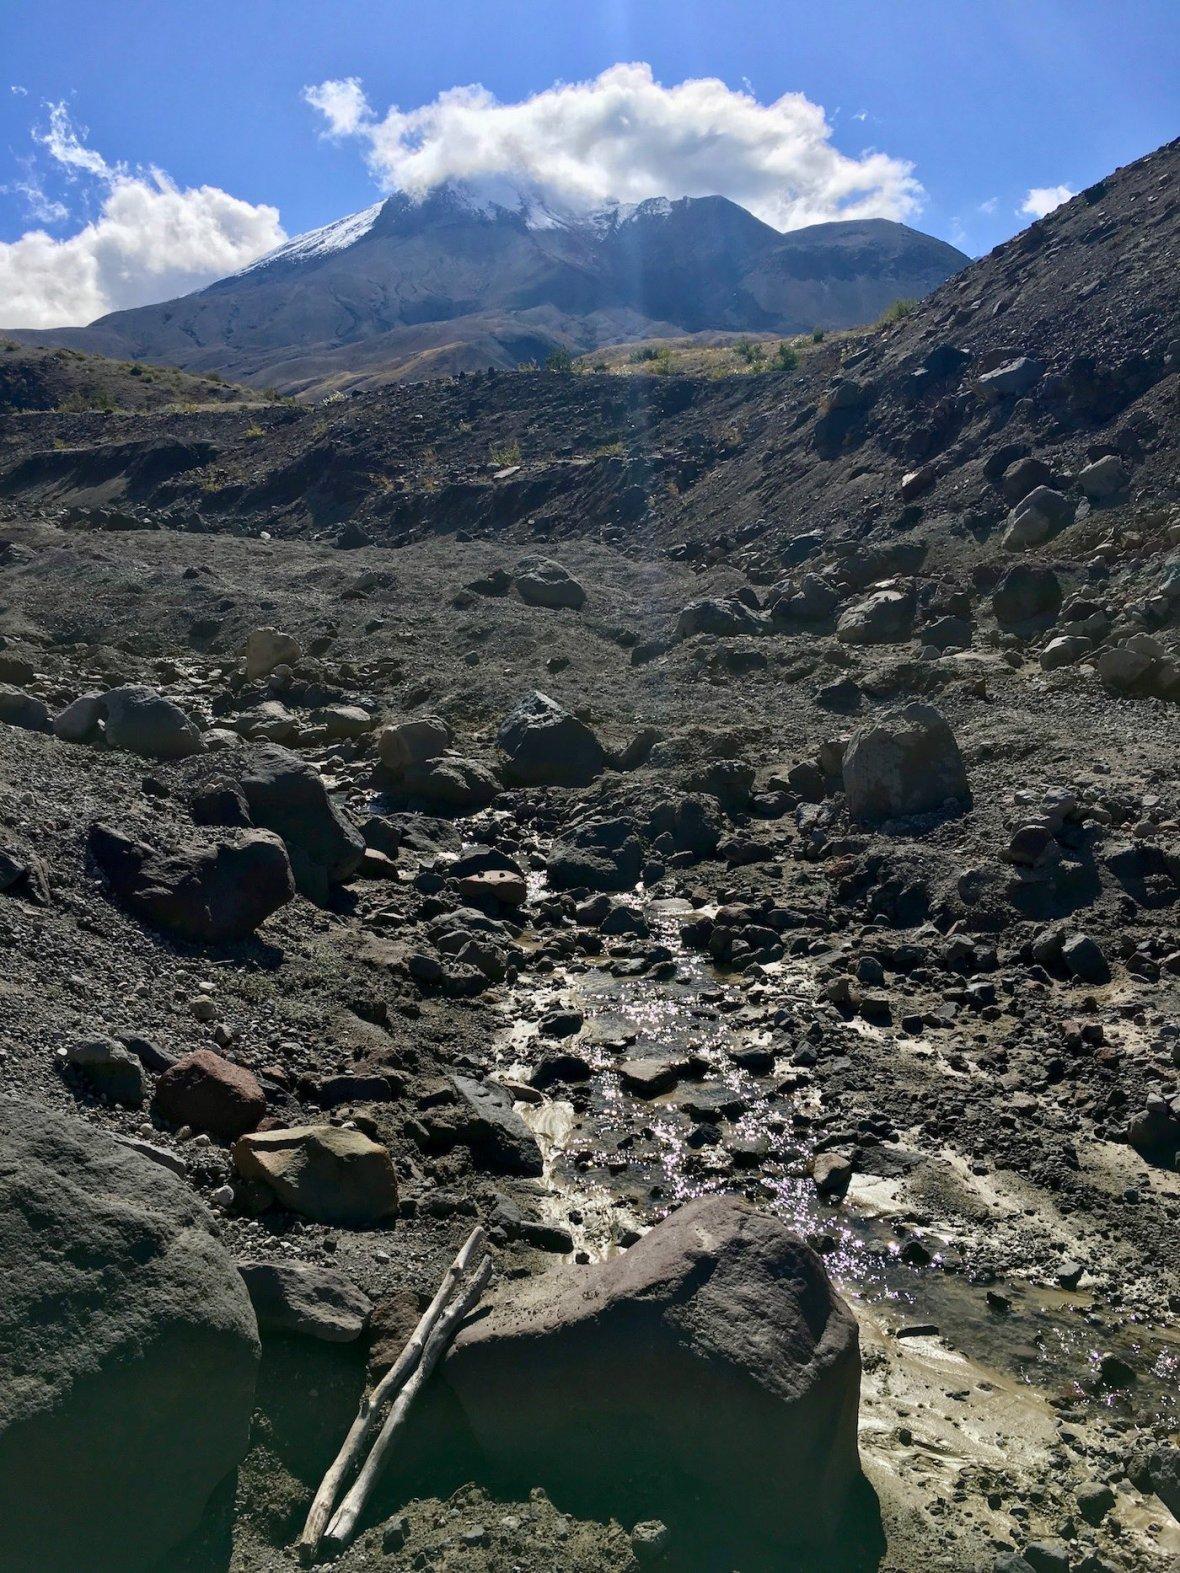 Stream running through Mount St. Helens National Volcanic Monument